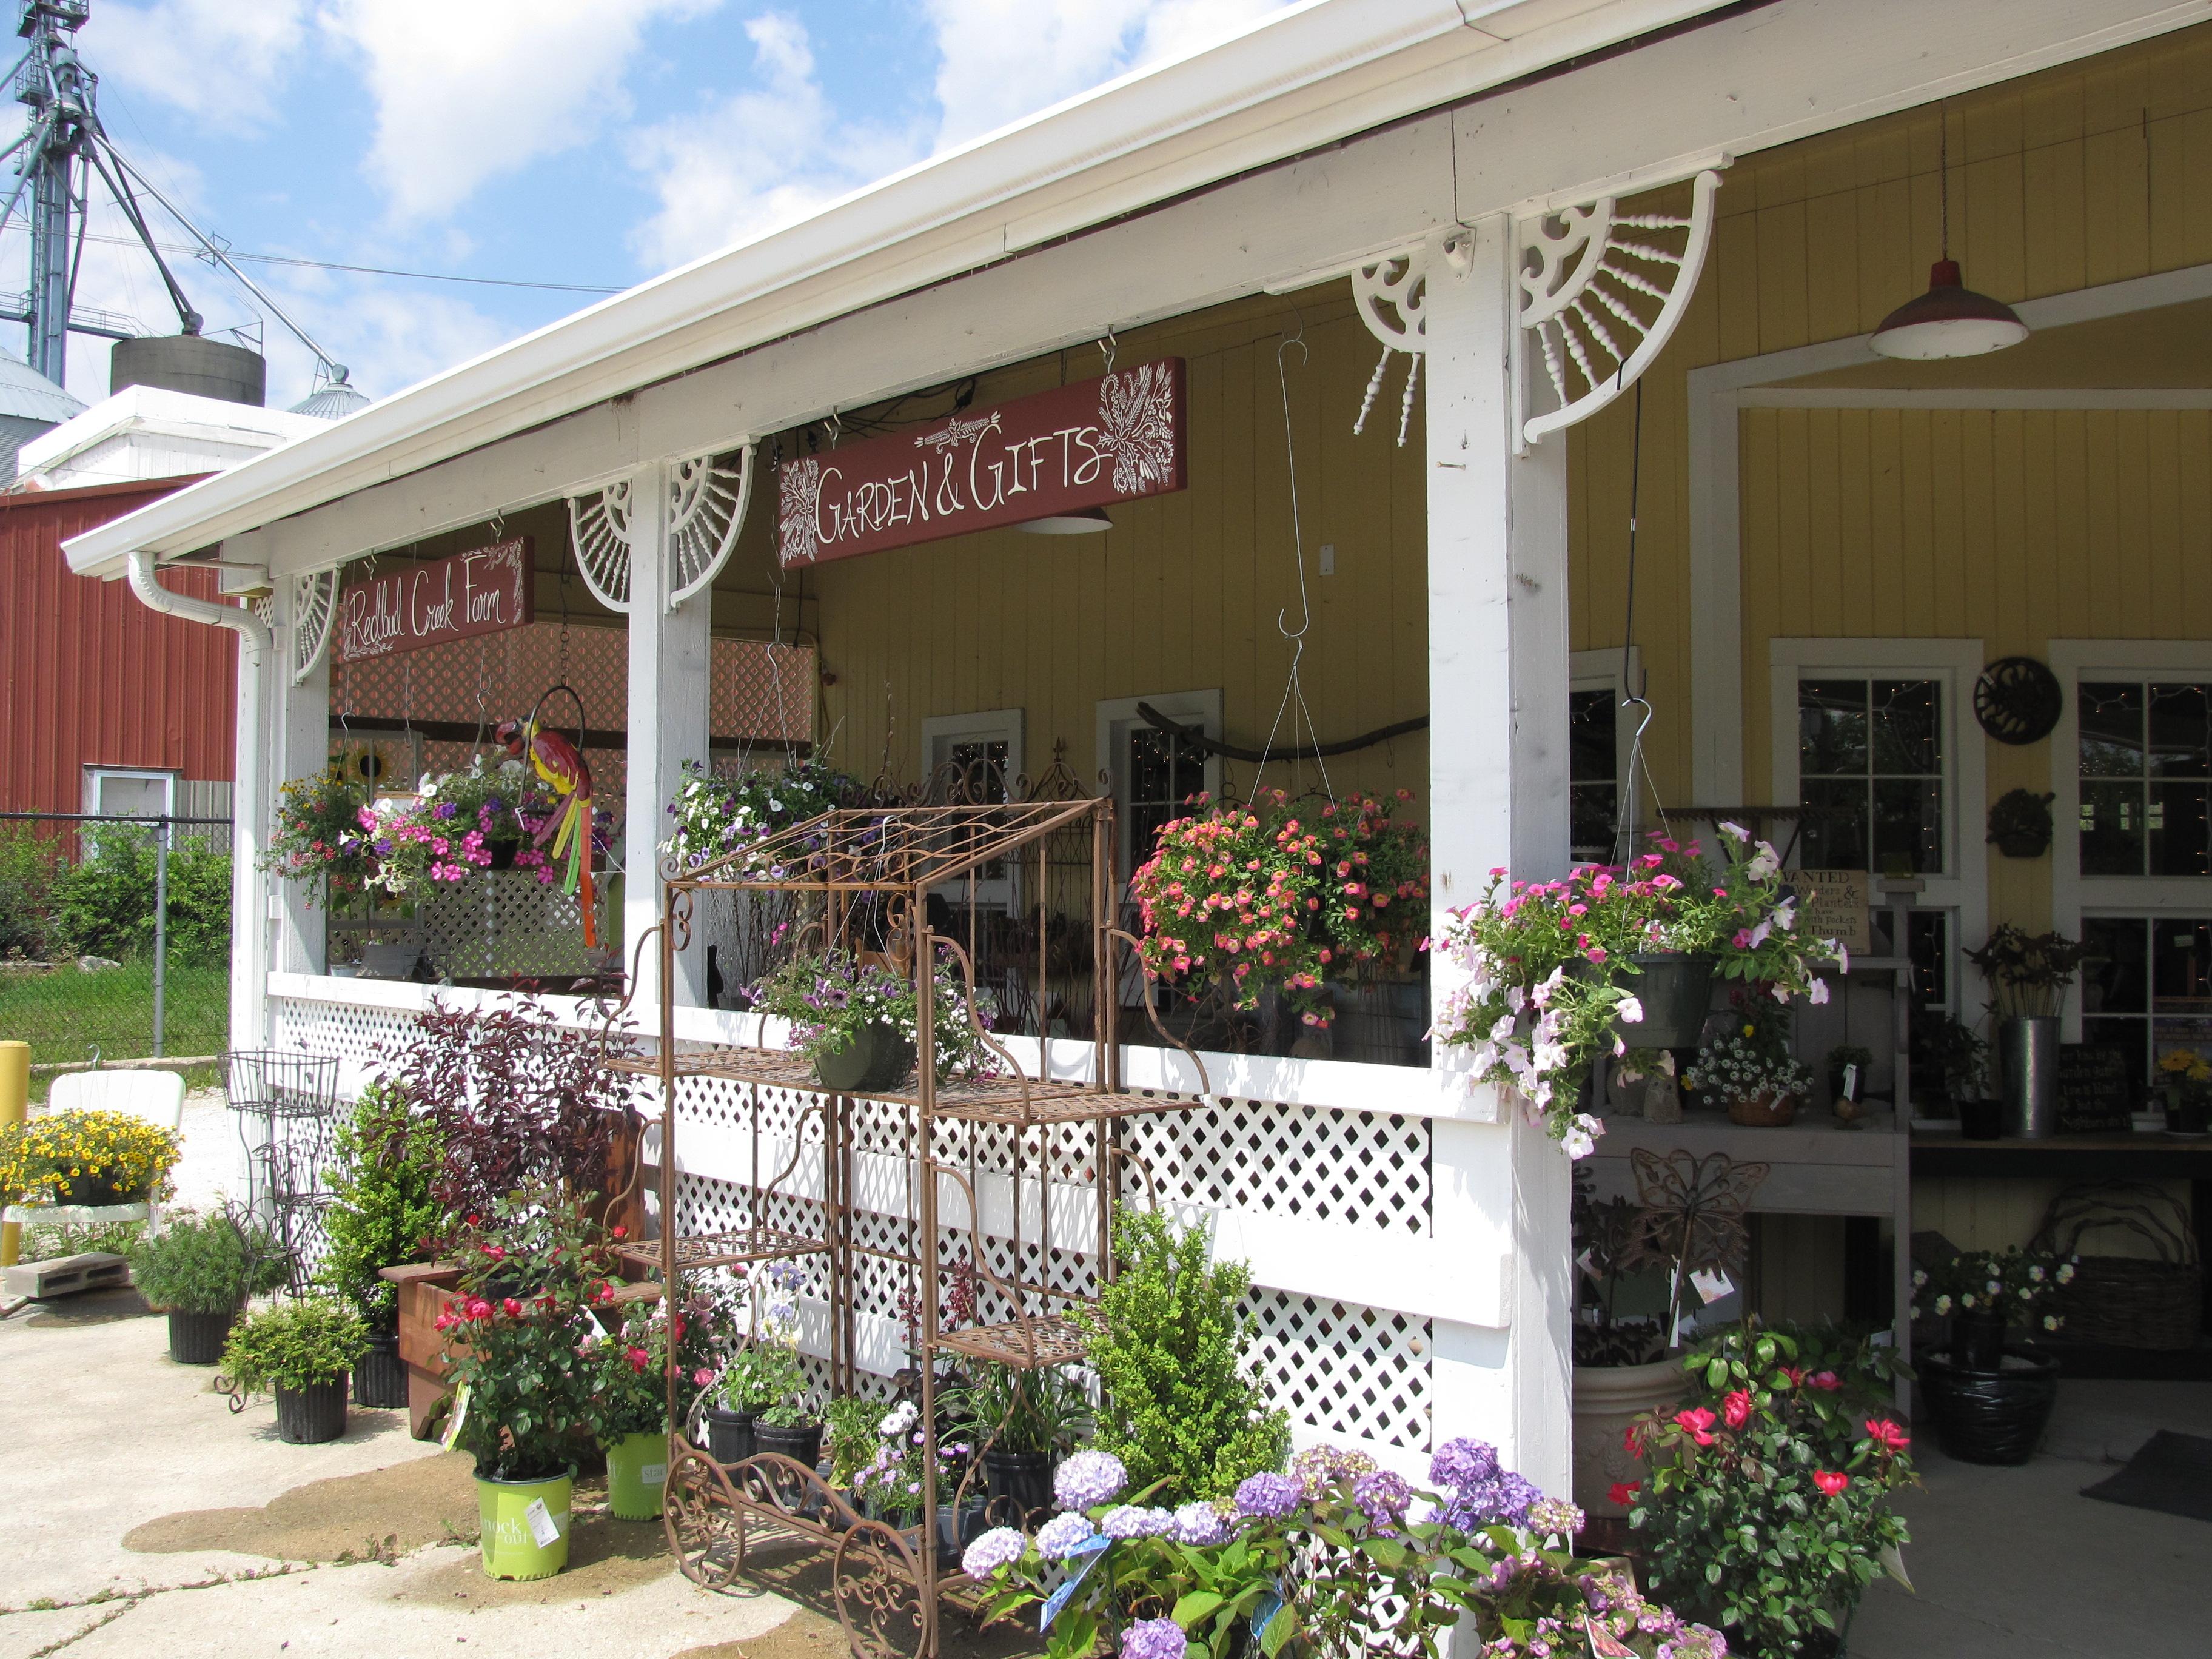 vintage 71 shops - Avant Garden